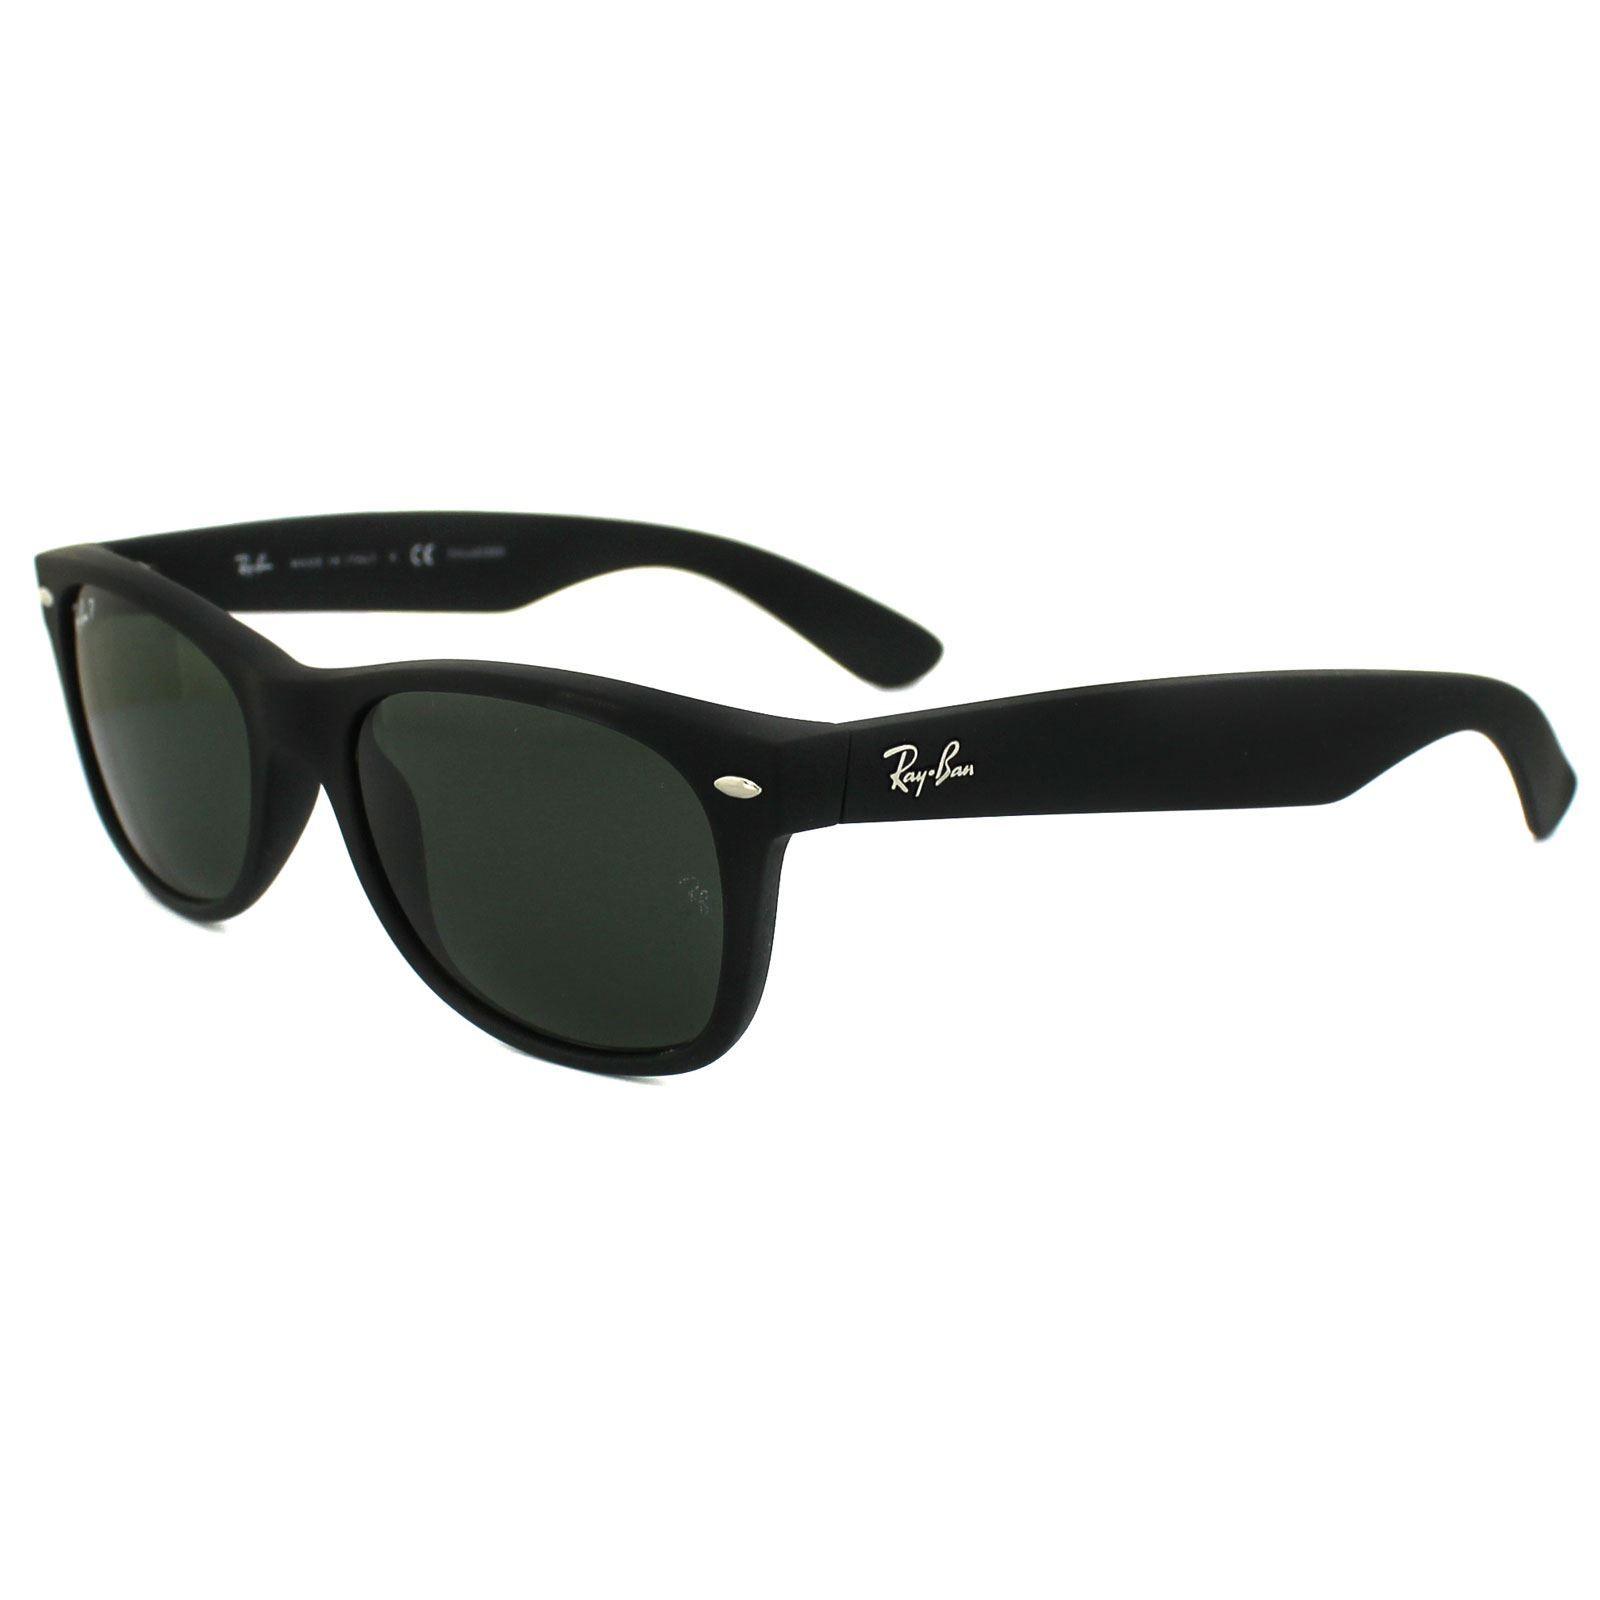 Ray-Ban Sunglasses New Wayfarer 2132 622/58 Rubber Black Green Polarized 52mm